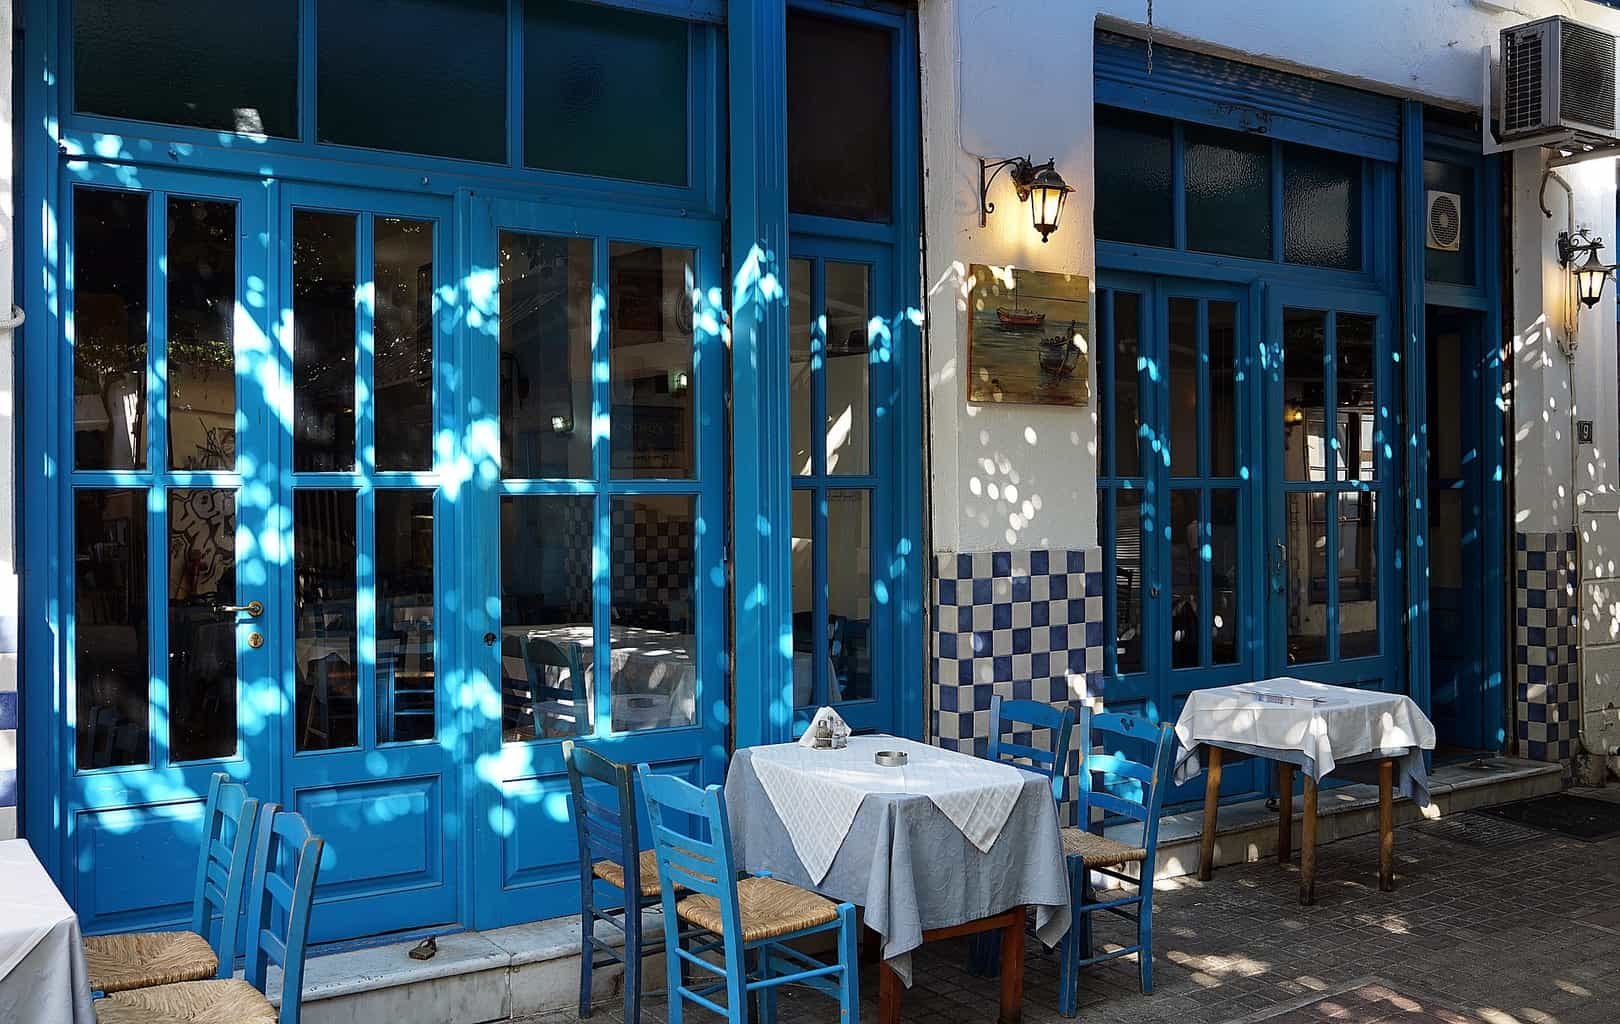 Greek Restaurant Near Me Now